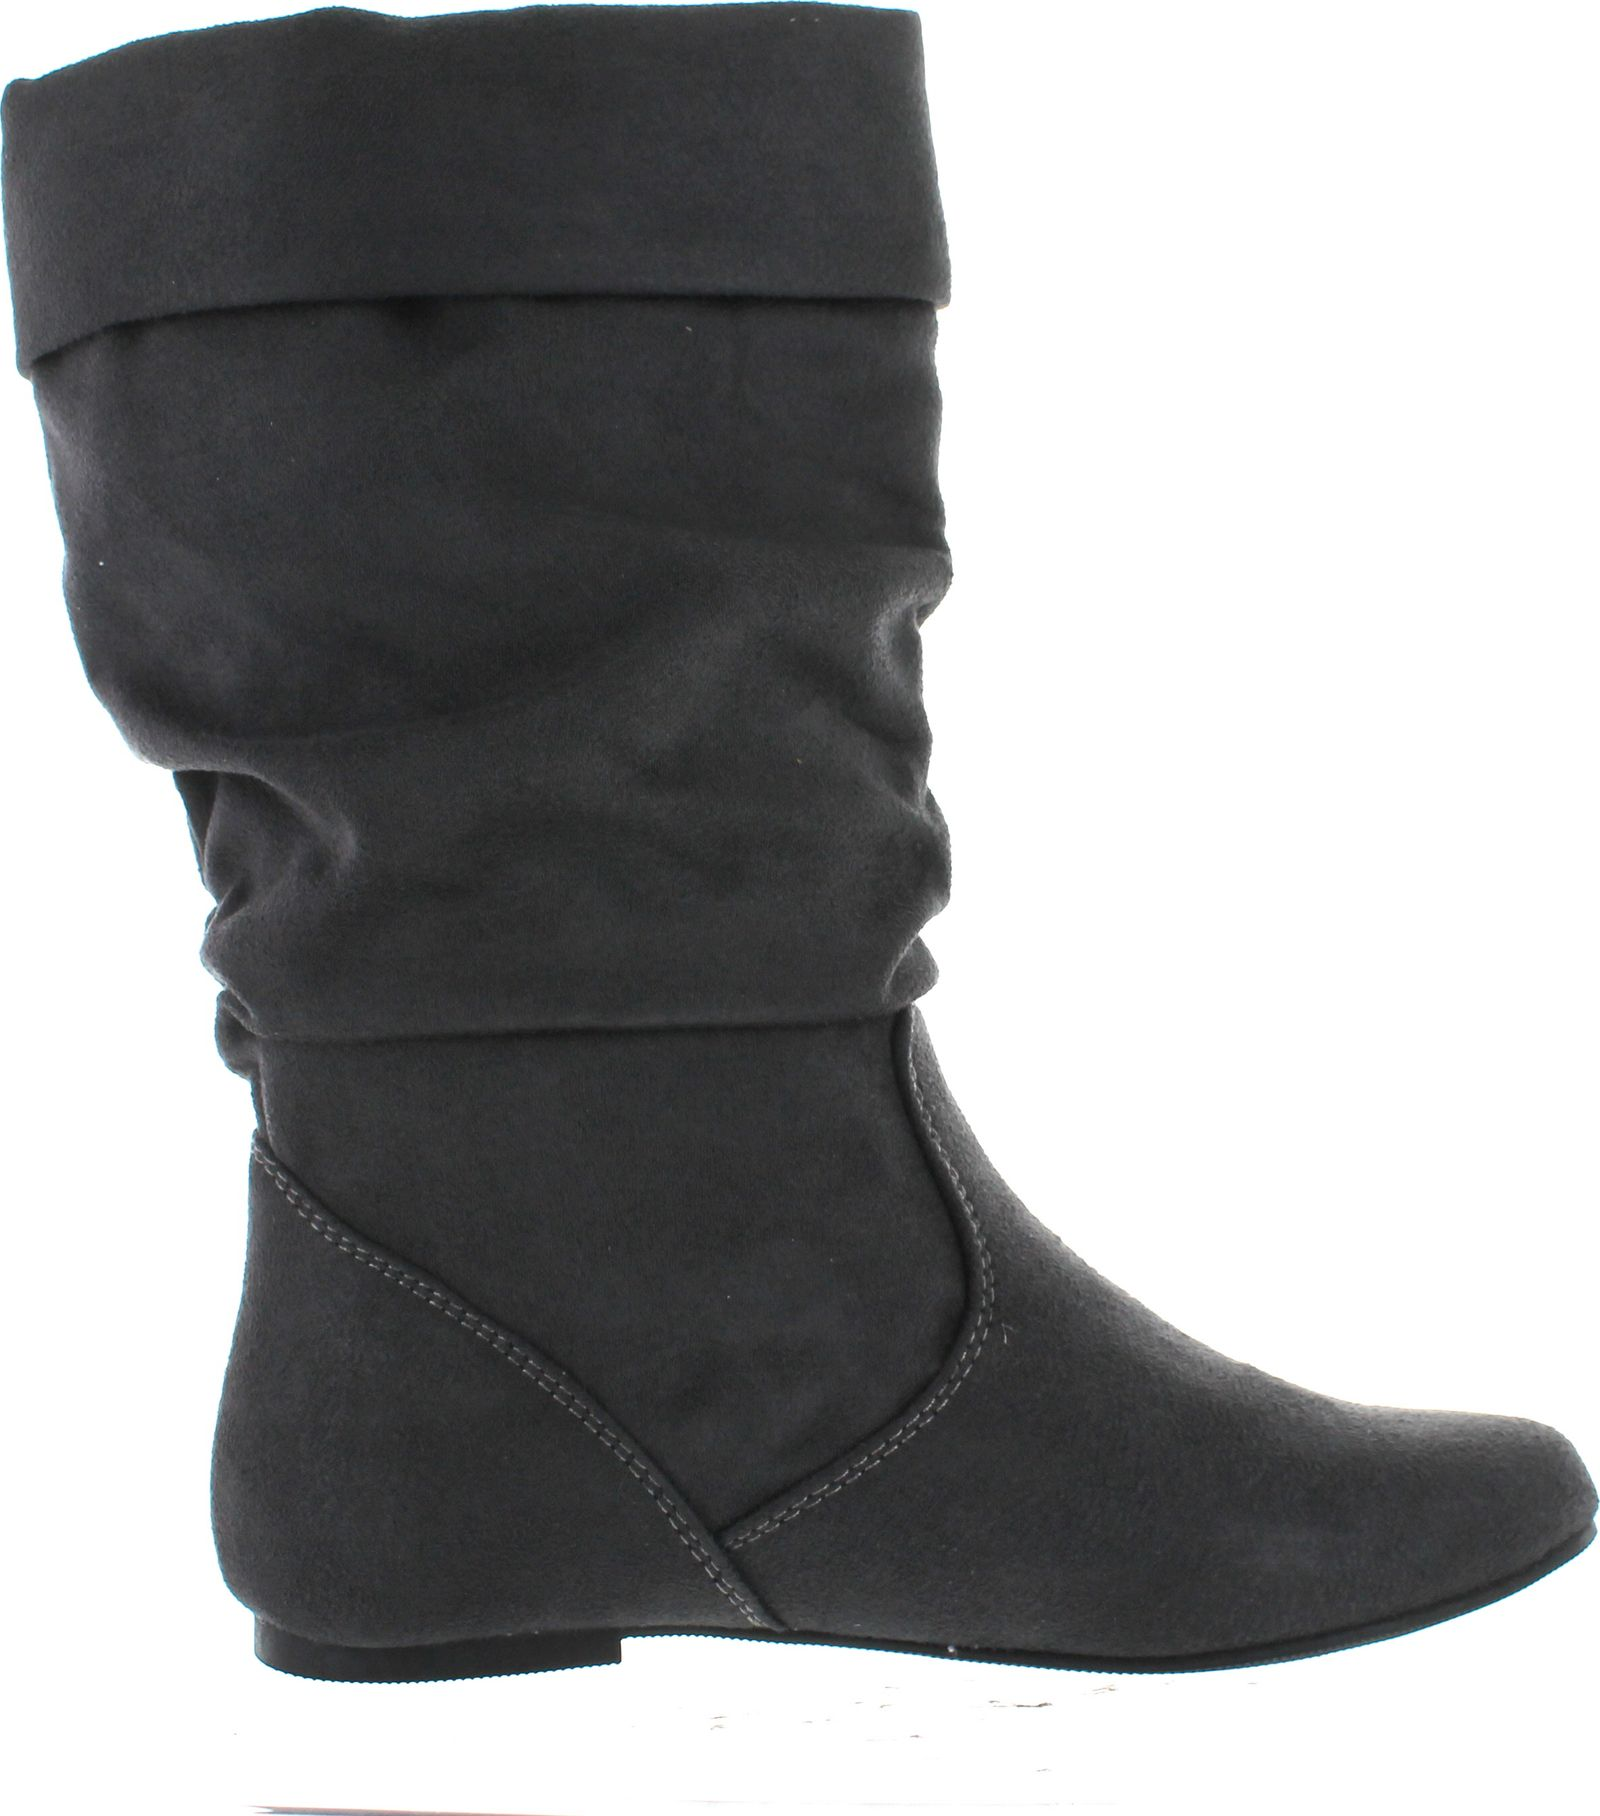 soda image s comfortable flat mid calf boot shoes ebay